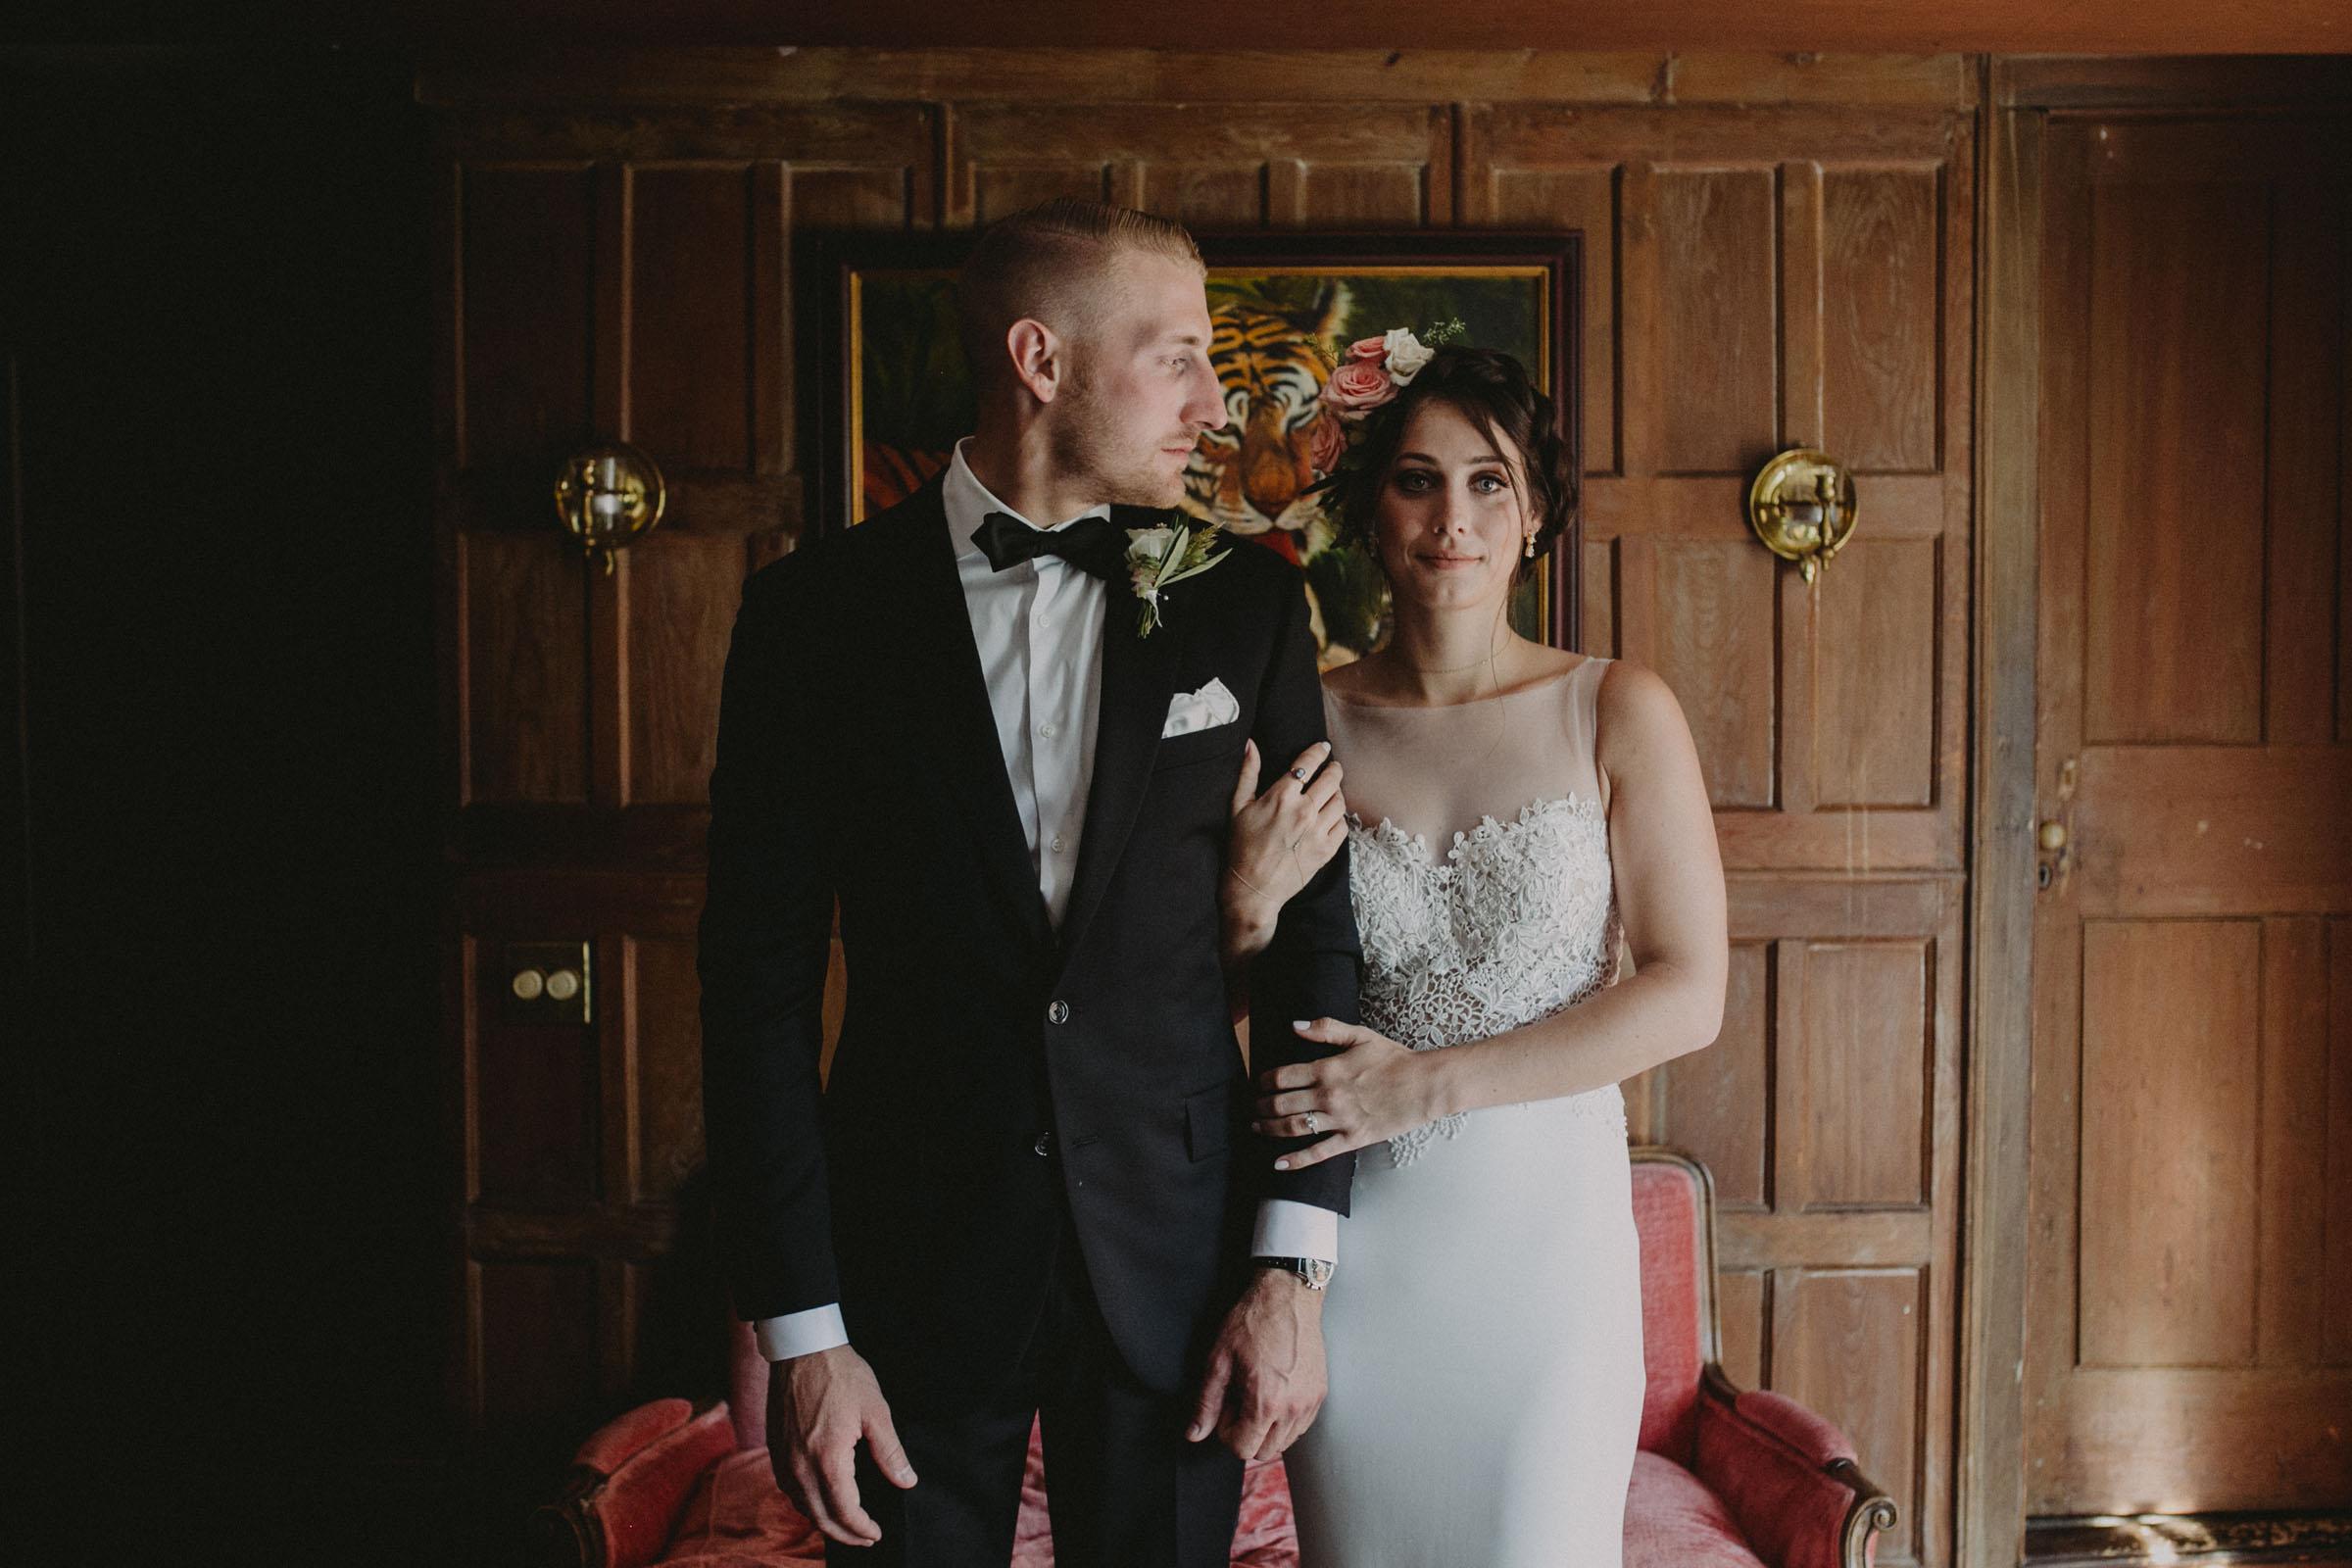 Categories: Weddings-Real Wedding: Lilia + Douglas - Photography by Falcon Griffith & Daniel Orren